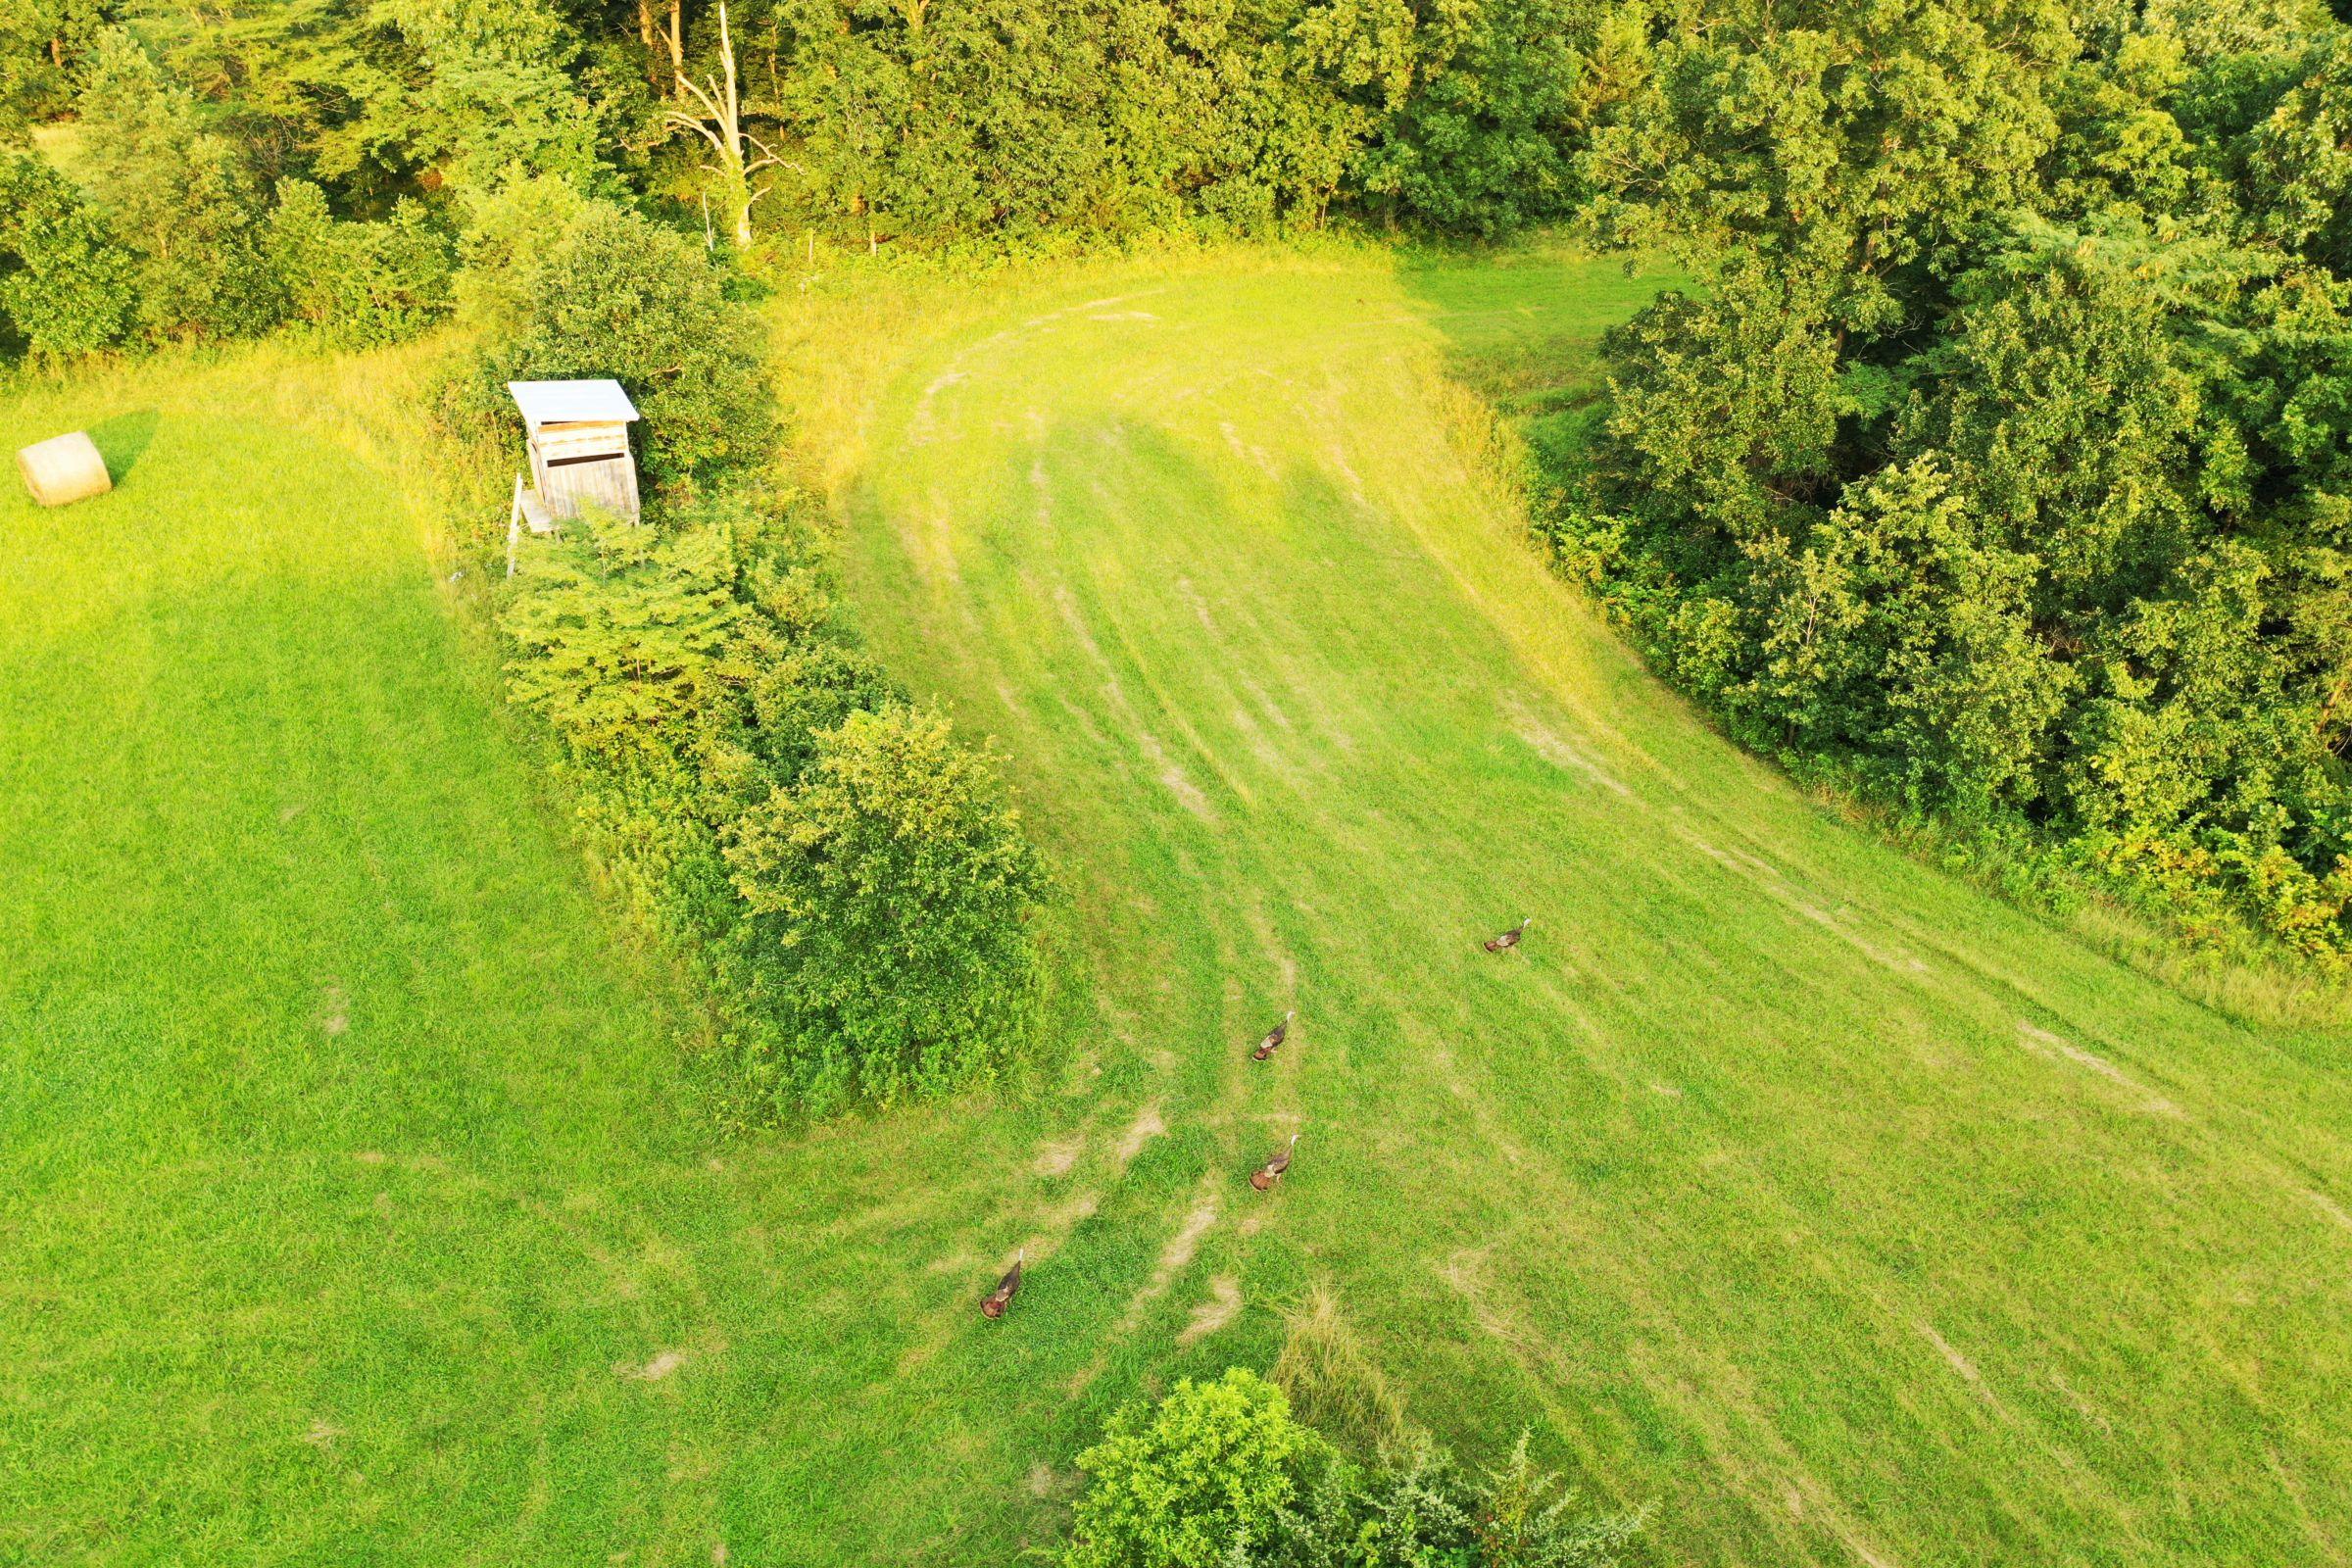 land-lee-county-iowa-340-acres-listing-number-15649-3-2021-07-21-185538.jpg